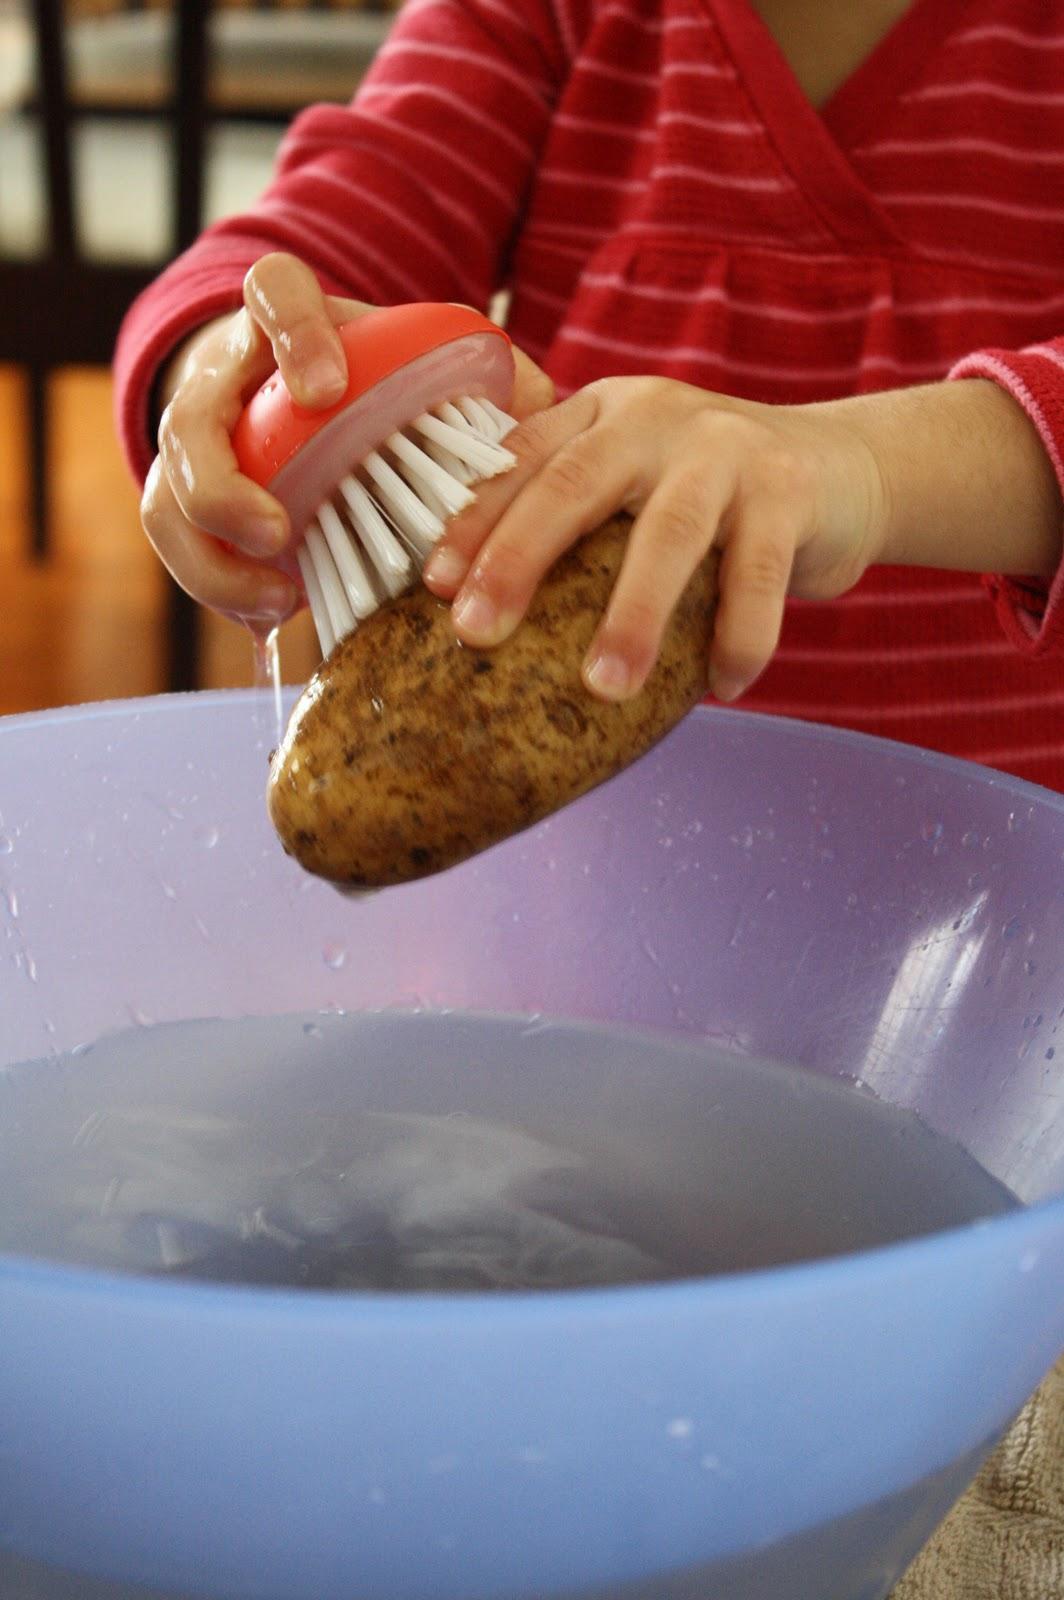 How To Scrub Potatoes : scrub, potatoes, Scrubbing, Potatoes, Nurturing, Learning